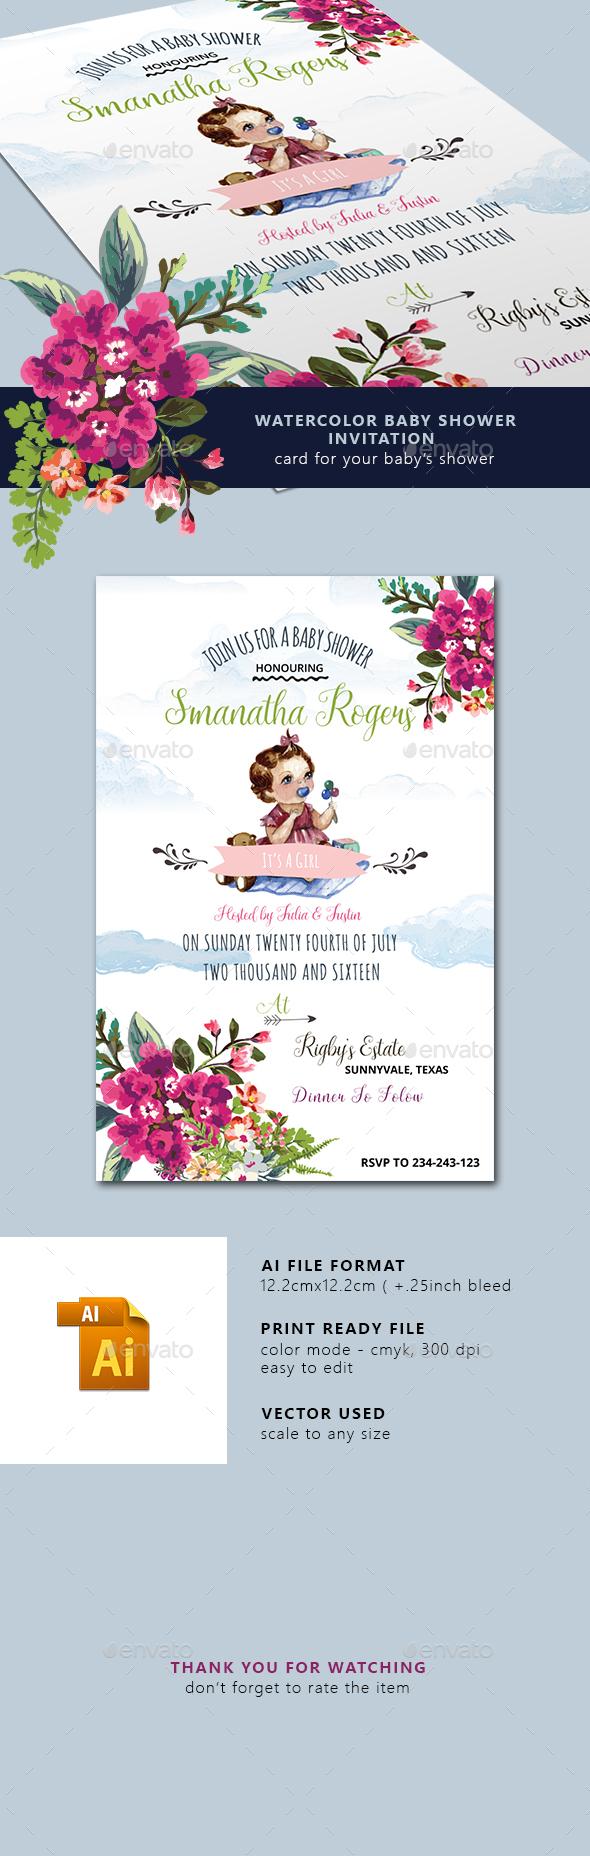 590x1856 Watercolor Baby Shower Invitation By Squirrel92 Graphicriver